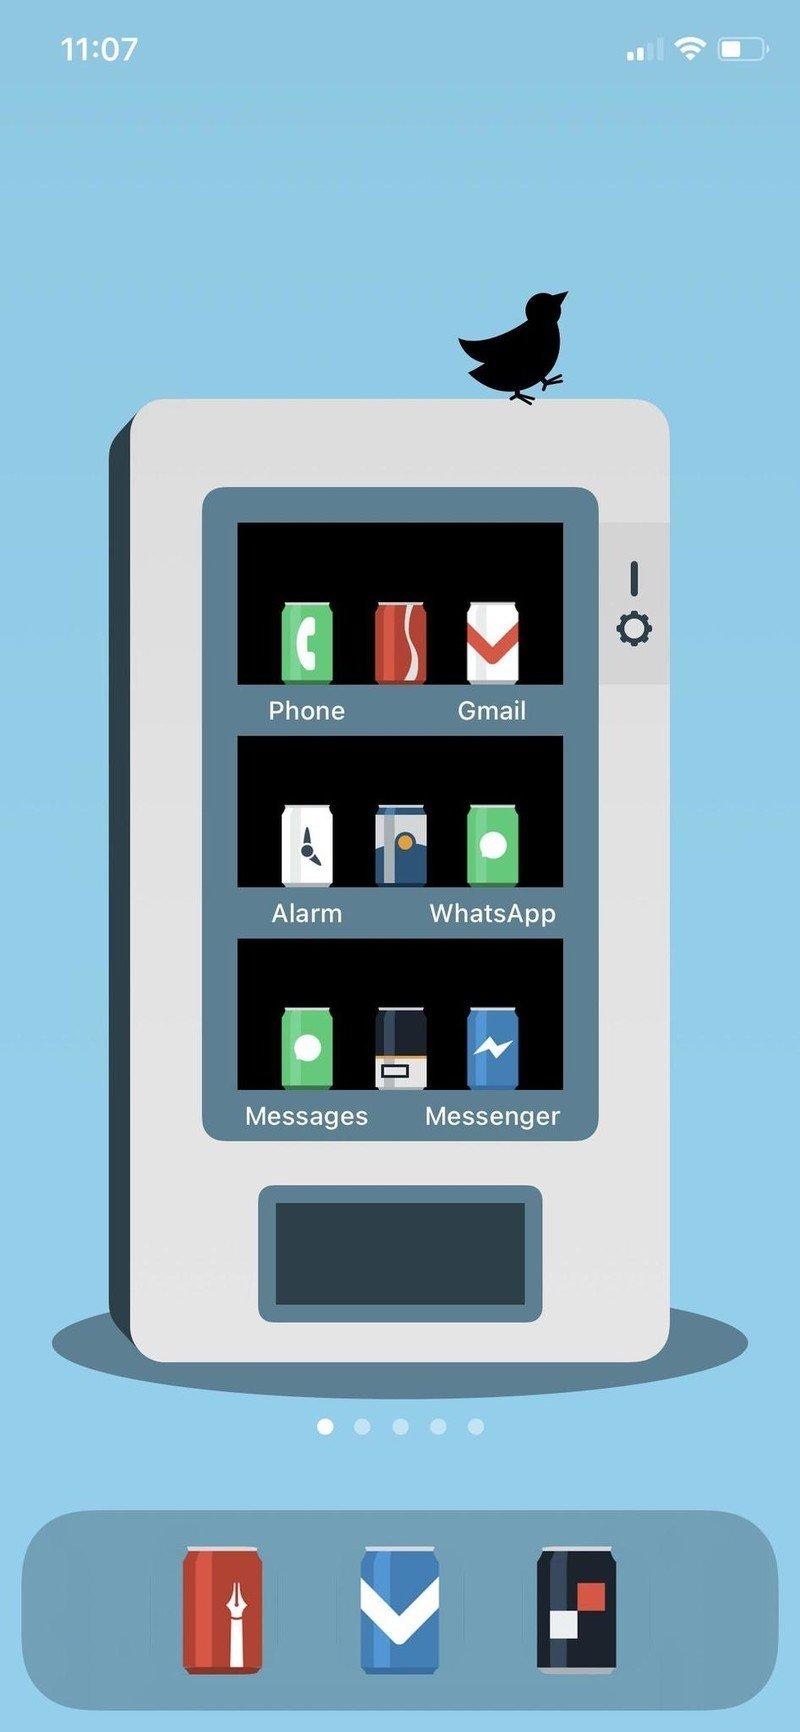 The Vending Machine Rascallop